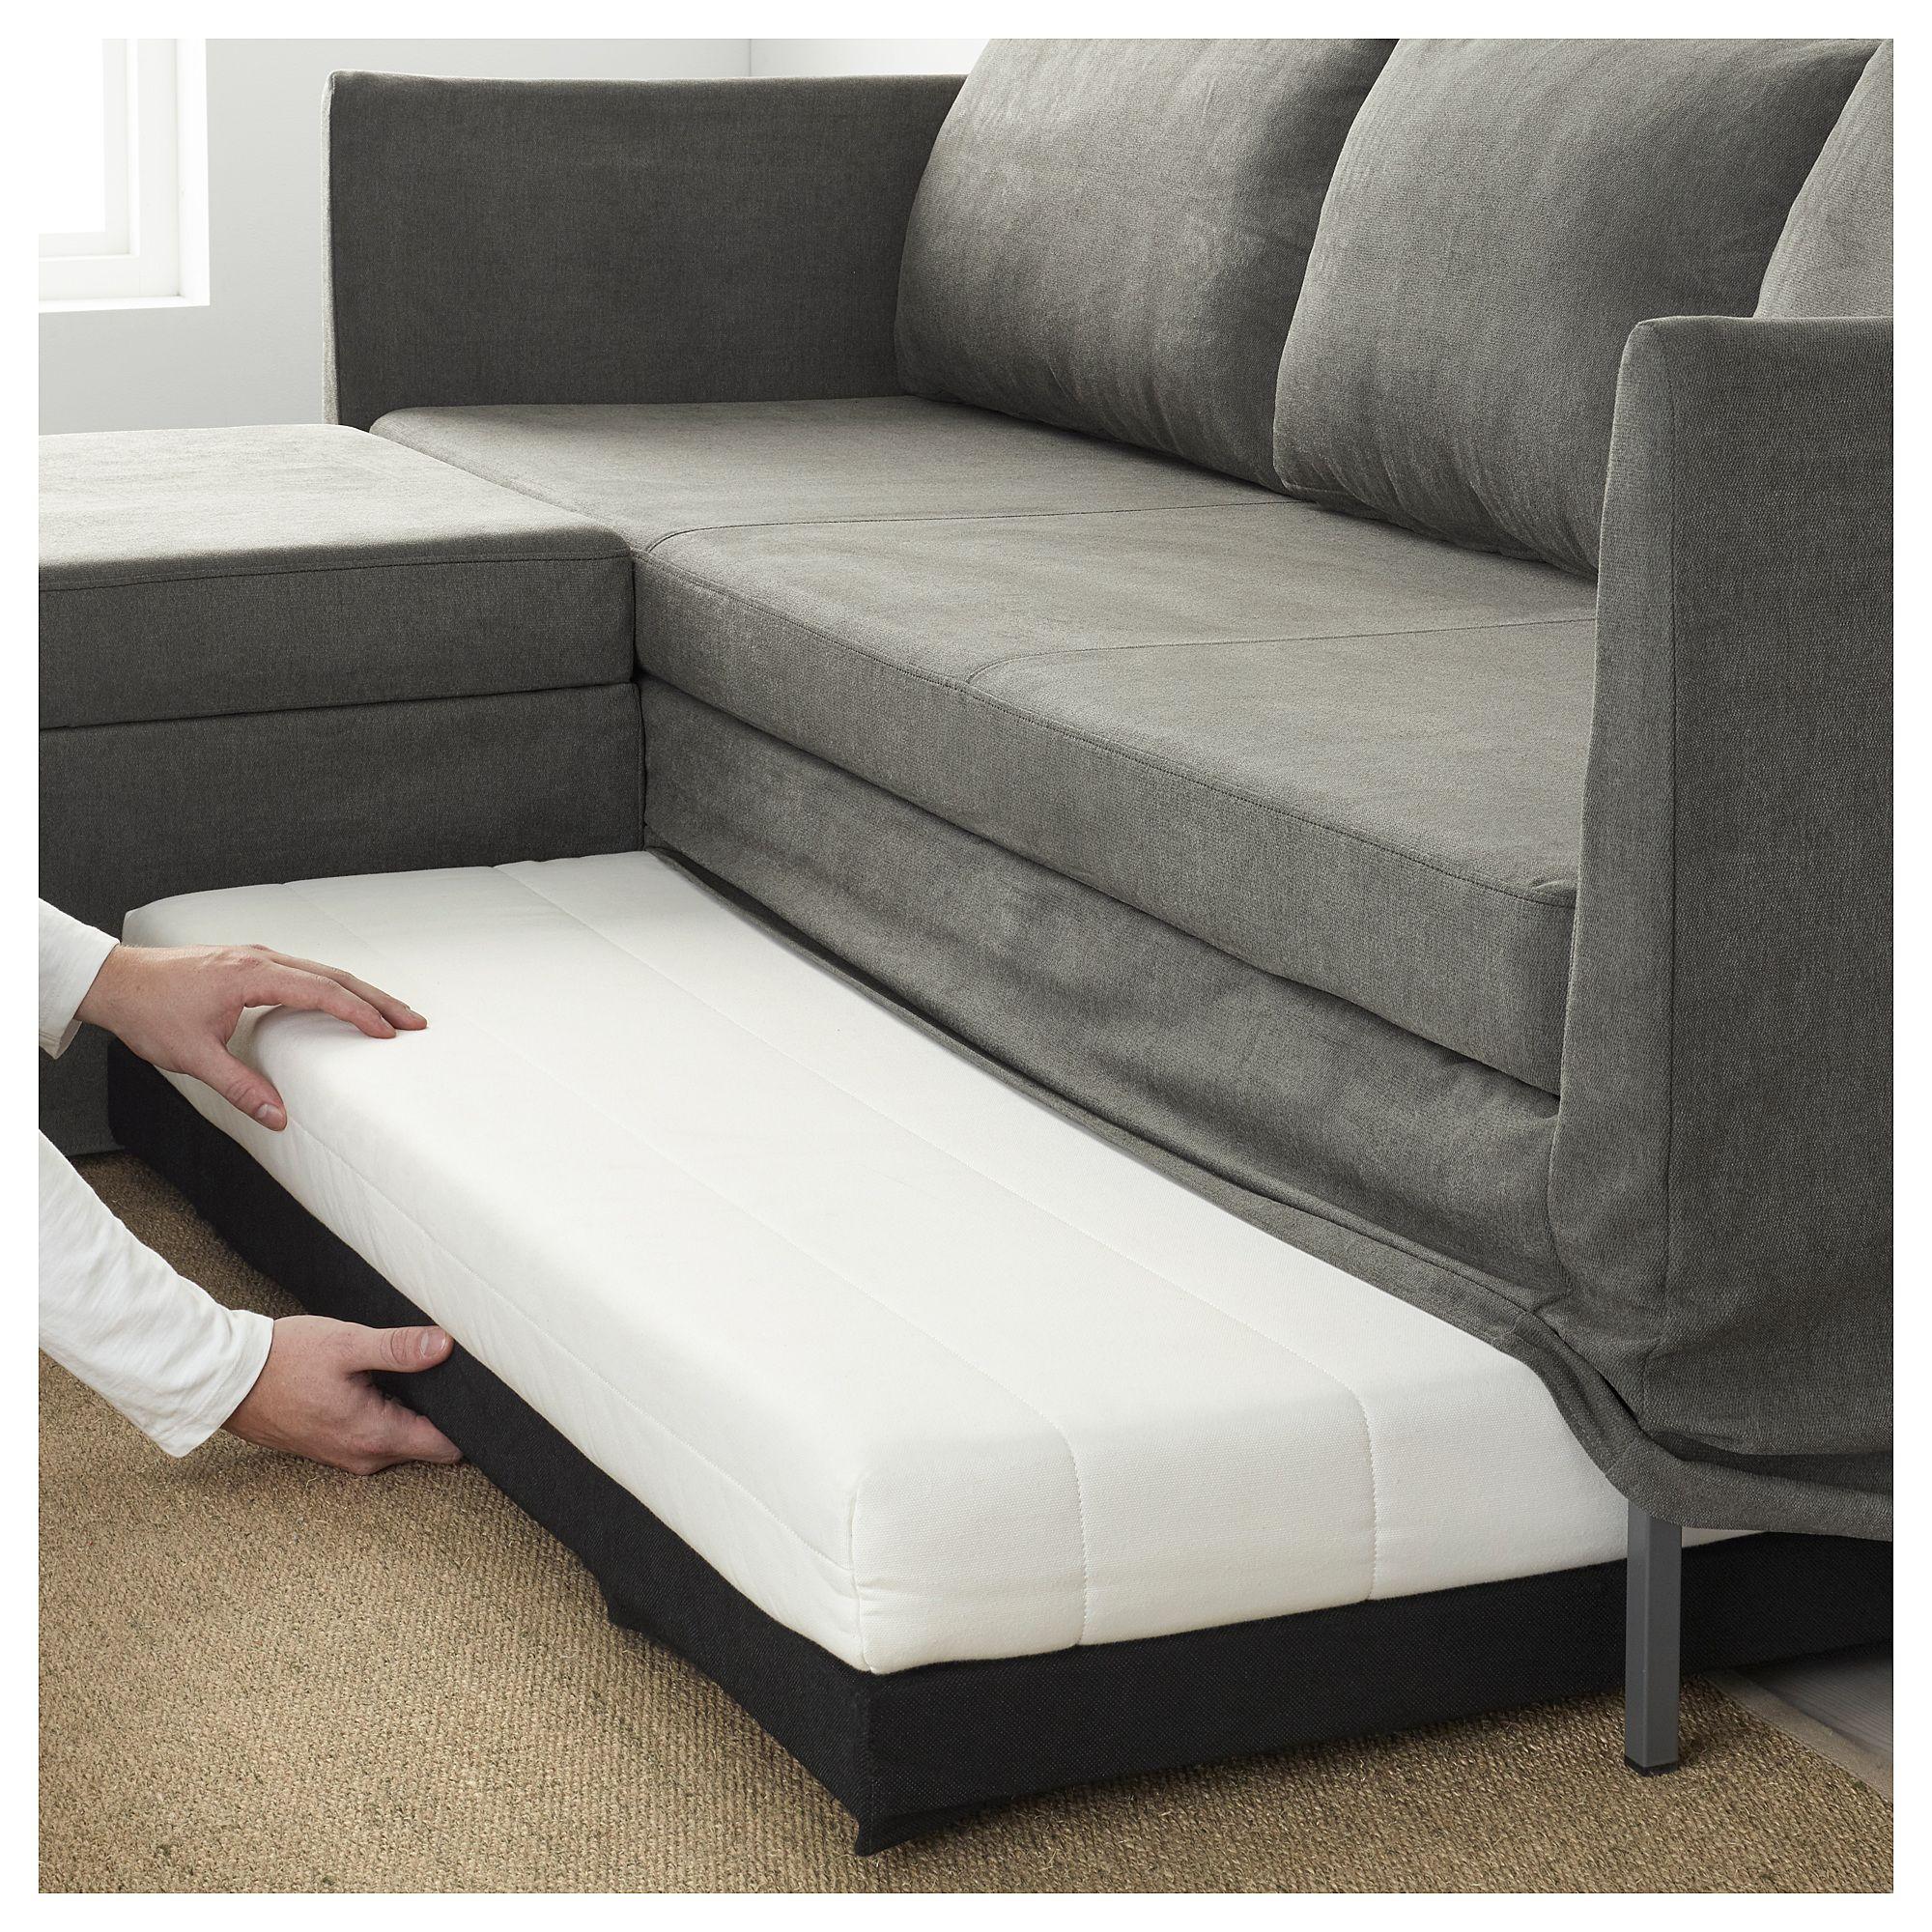 Corner Sofa Bed Green: BRÅTHULT Corner Sofa-bed Borred Grey-green - IKEA